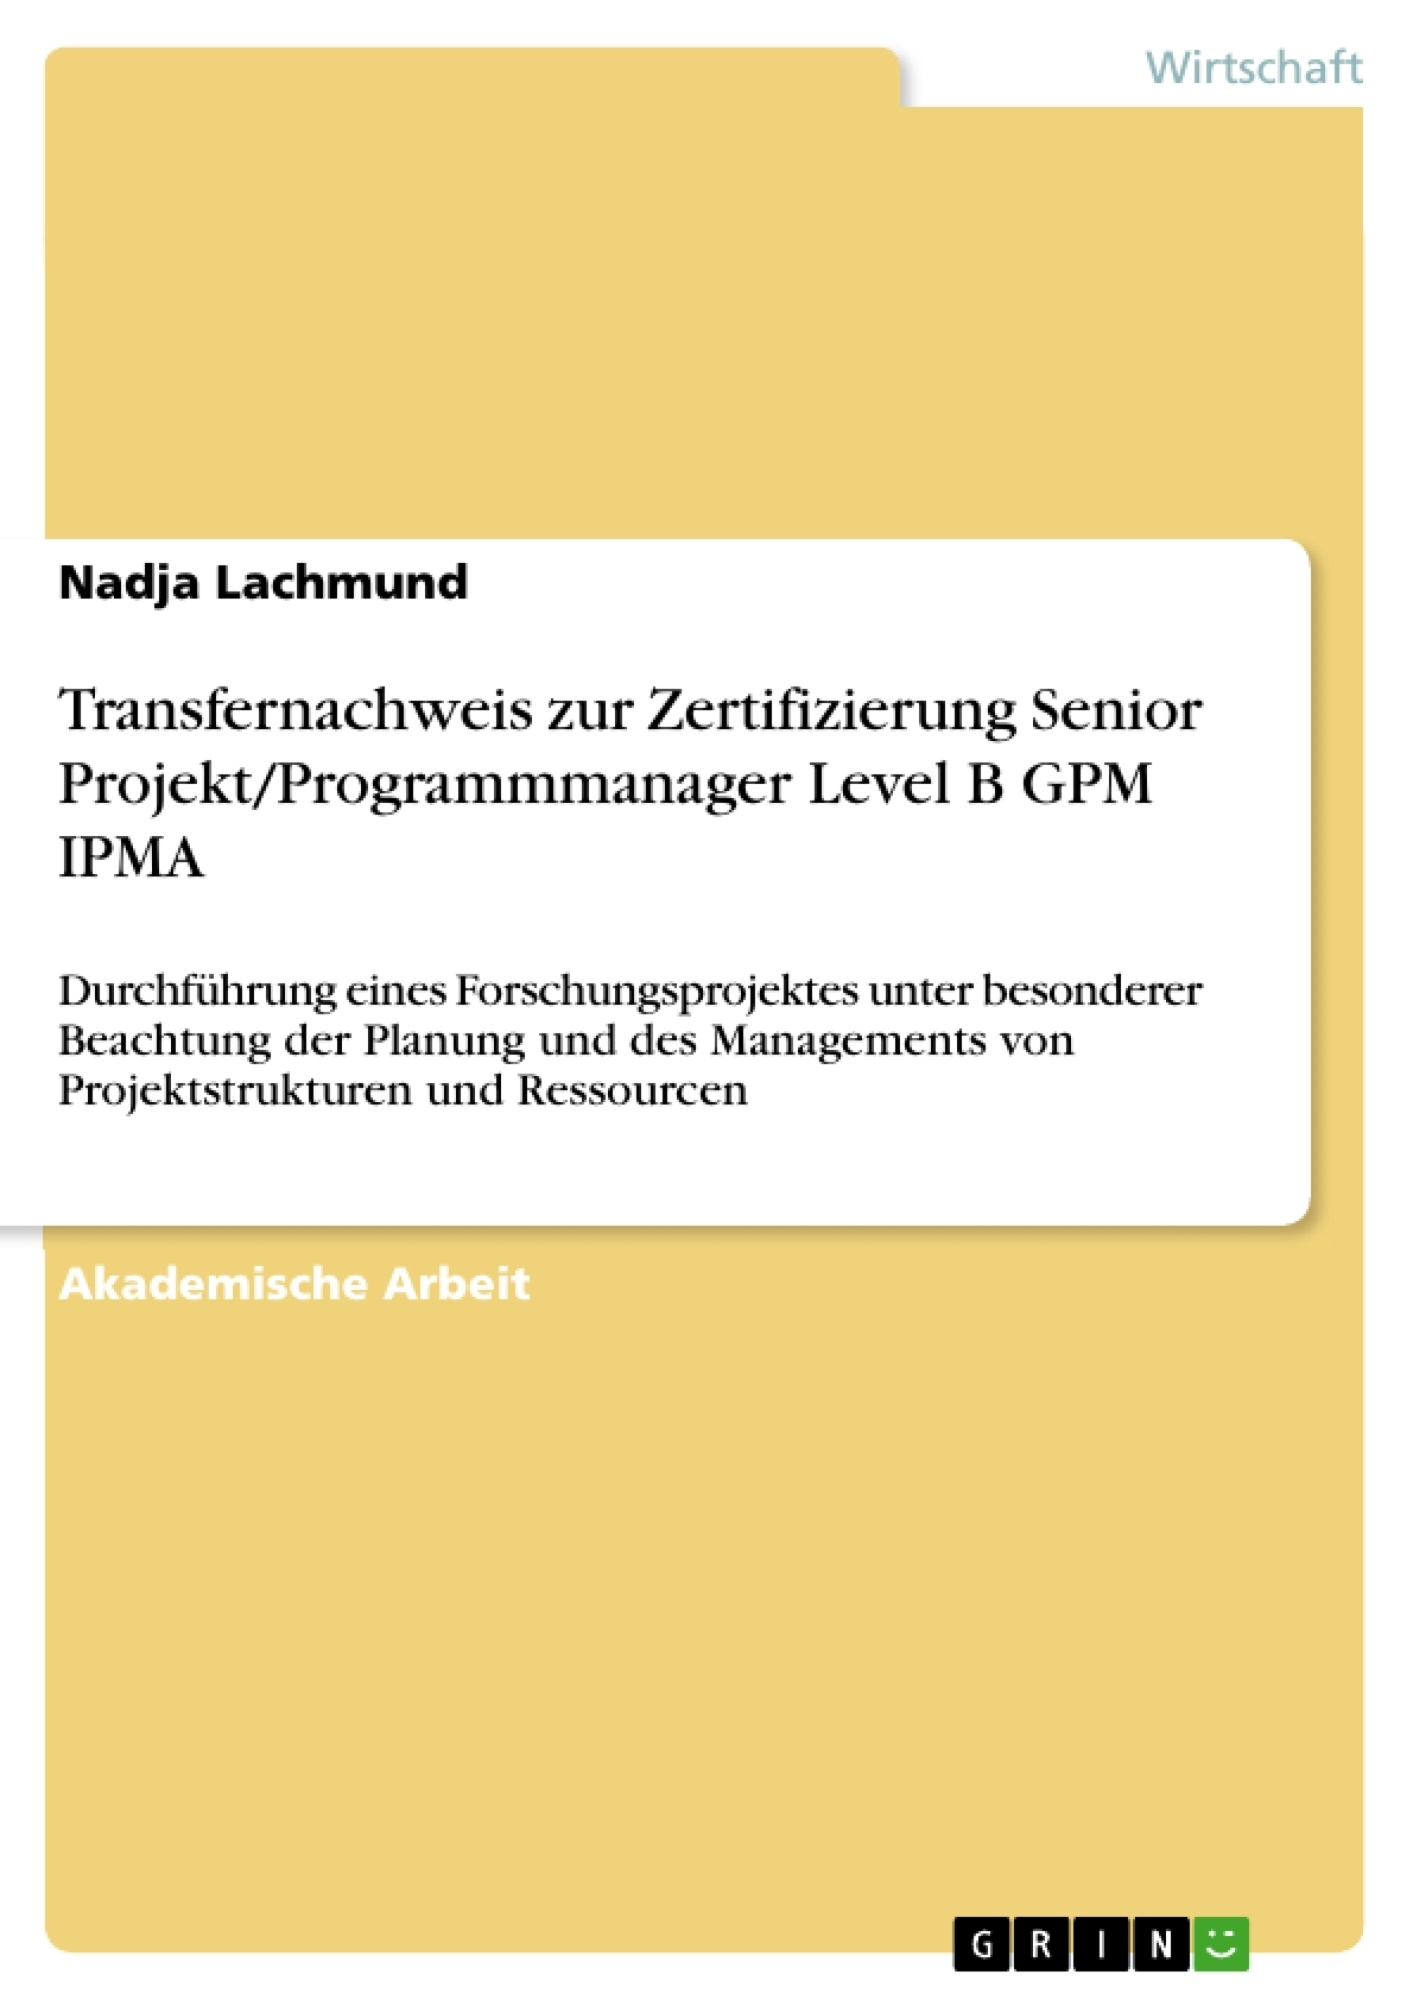 Titel: Transfernachweis zur Zertifizierung Senior Projekt/Programmmanager Level B GPM IPMA